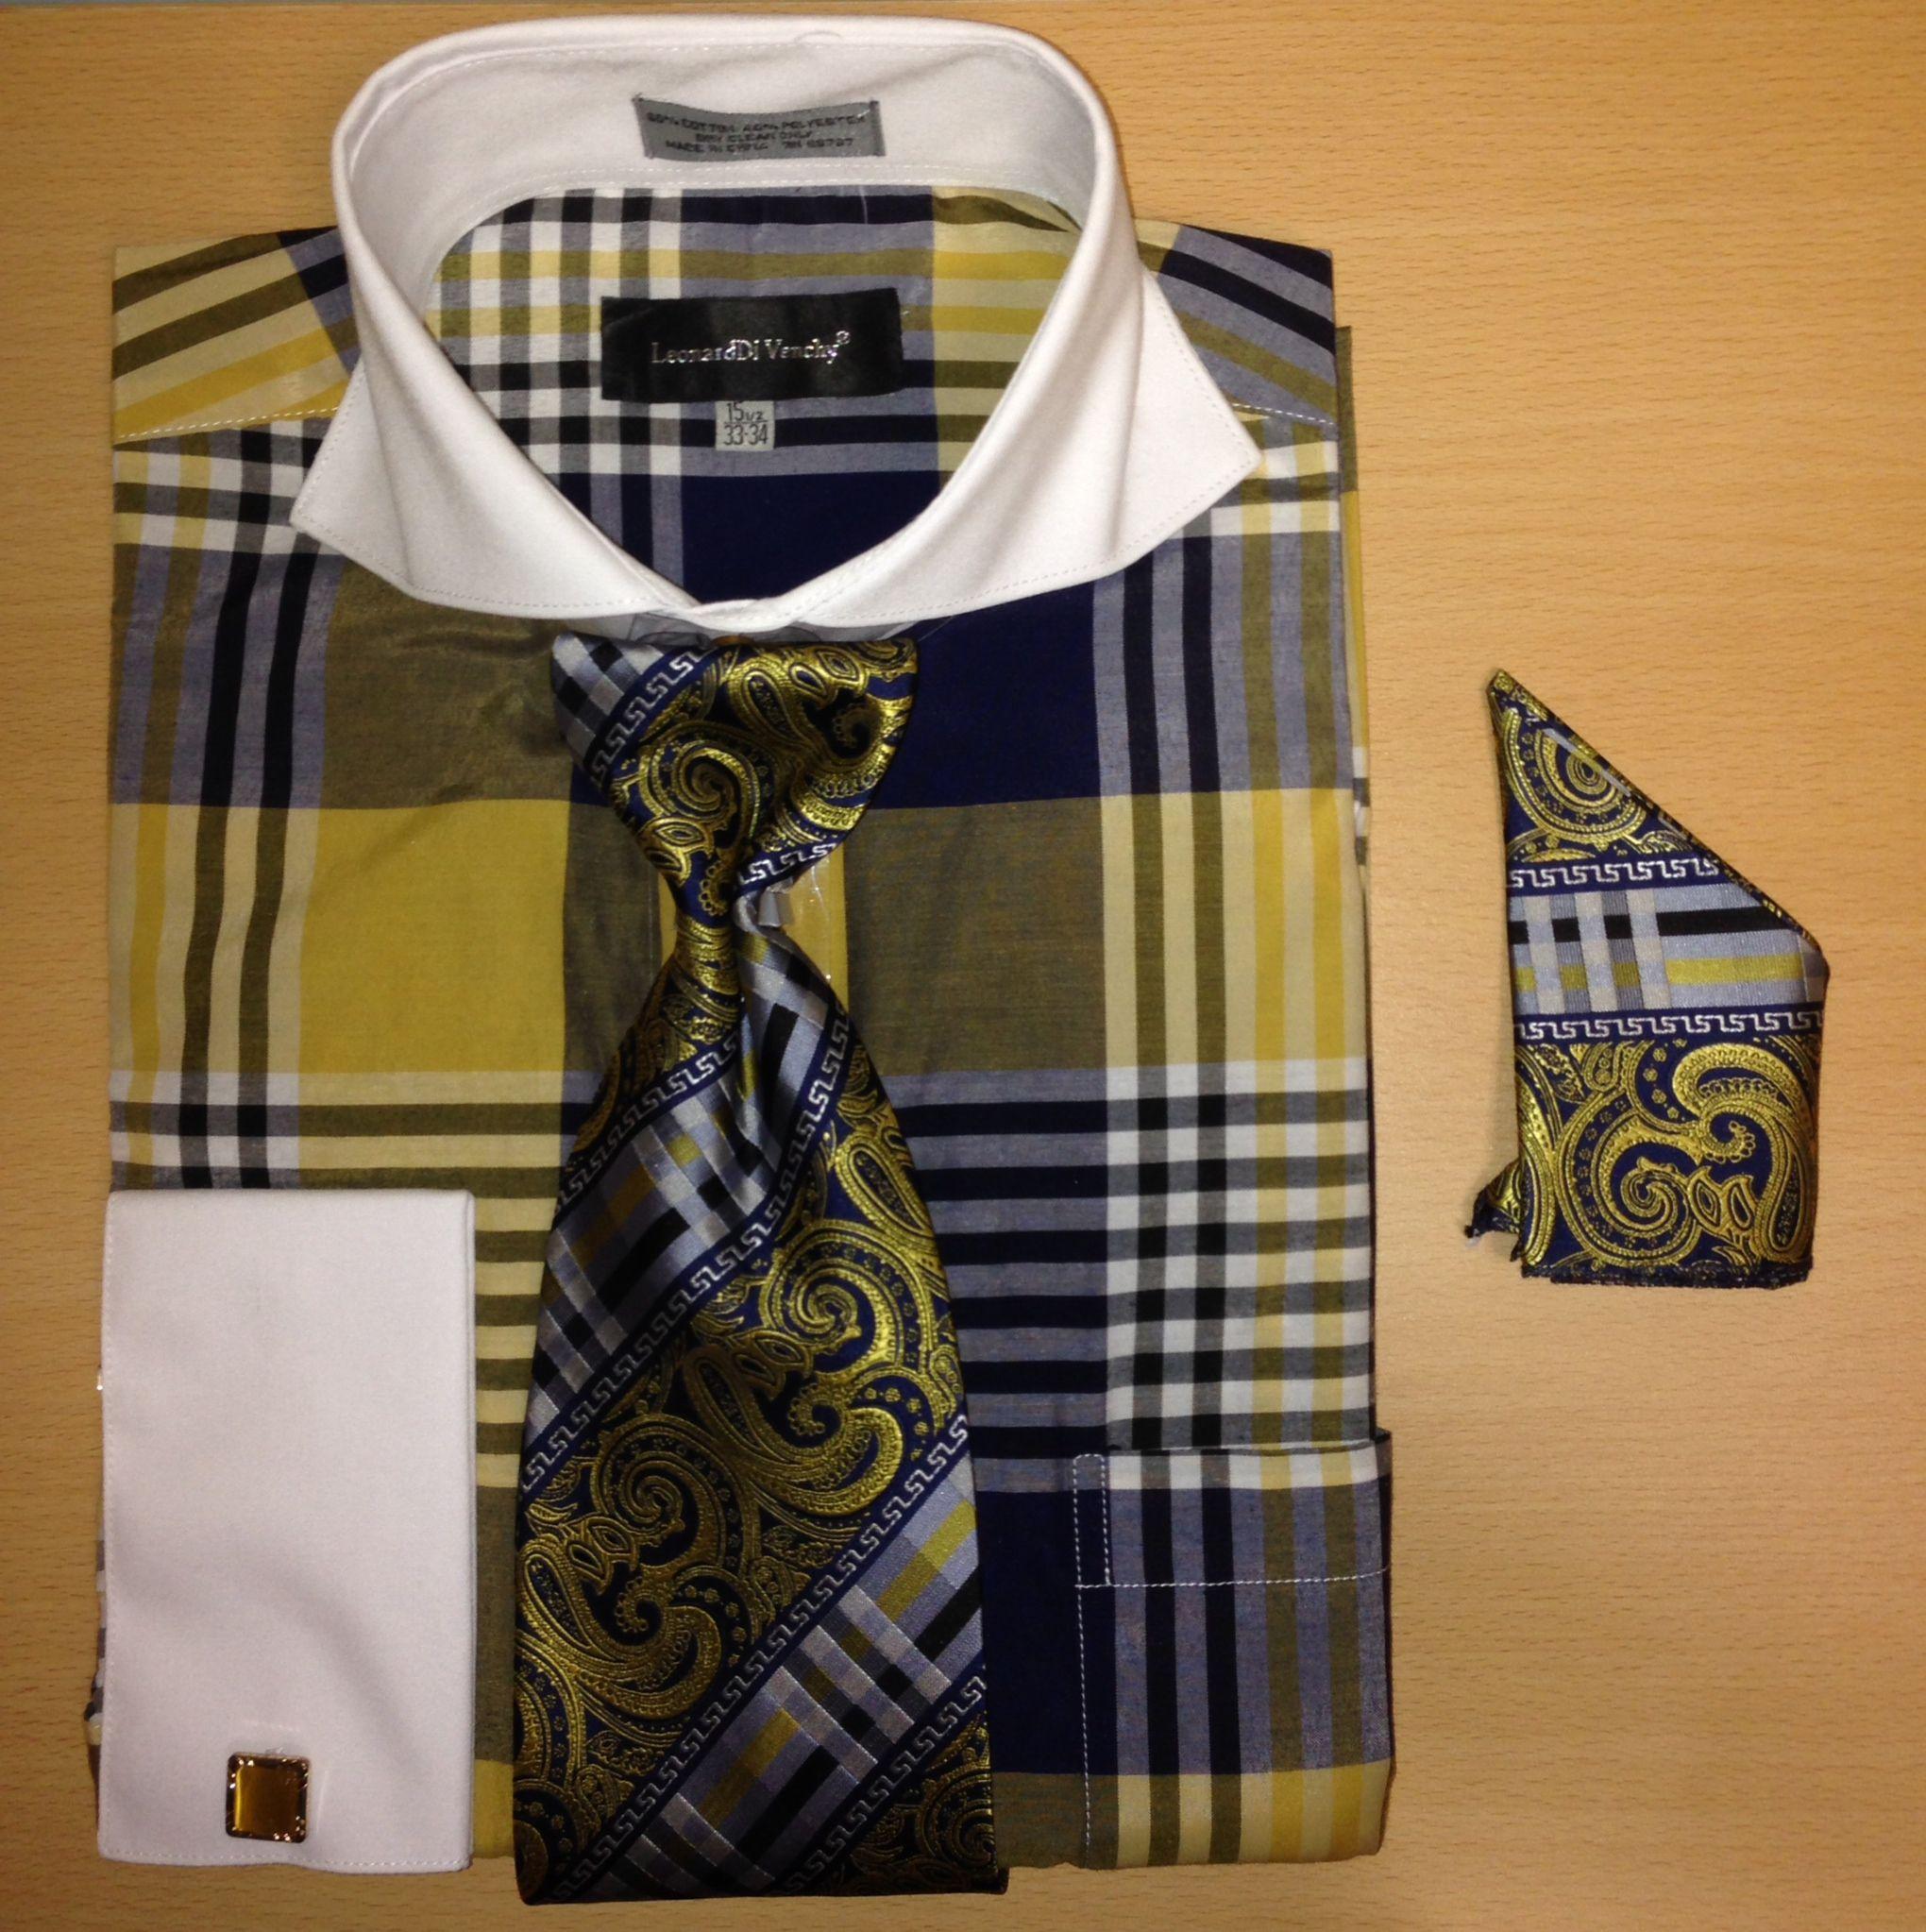 Men's Fashion Large Plaid Check Pattern Cufflink Dress Shirt Set - Navy and Gold